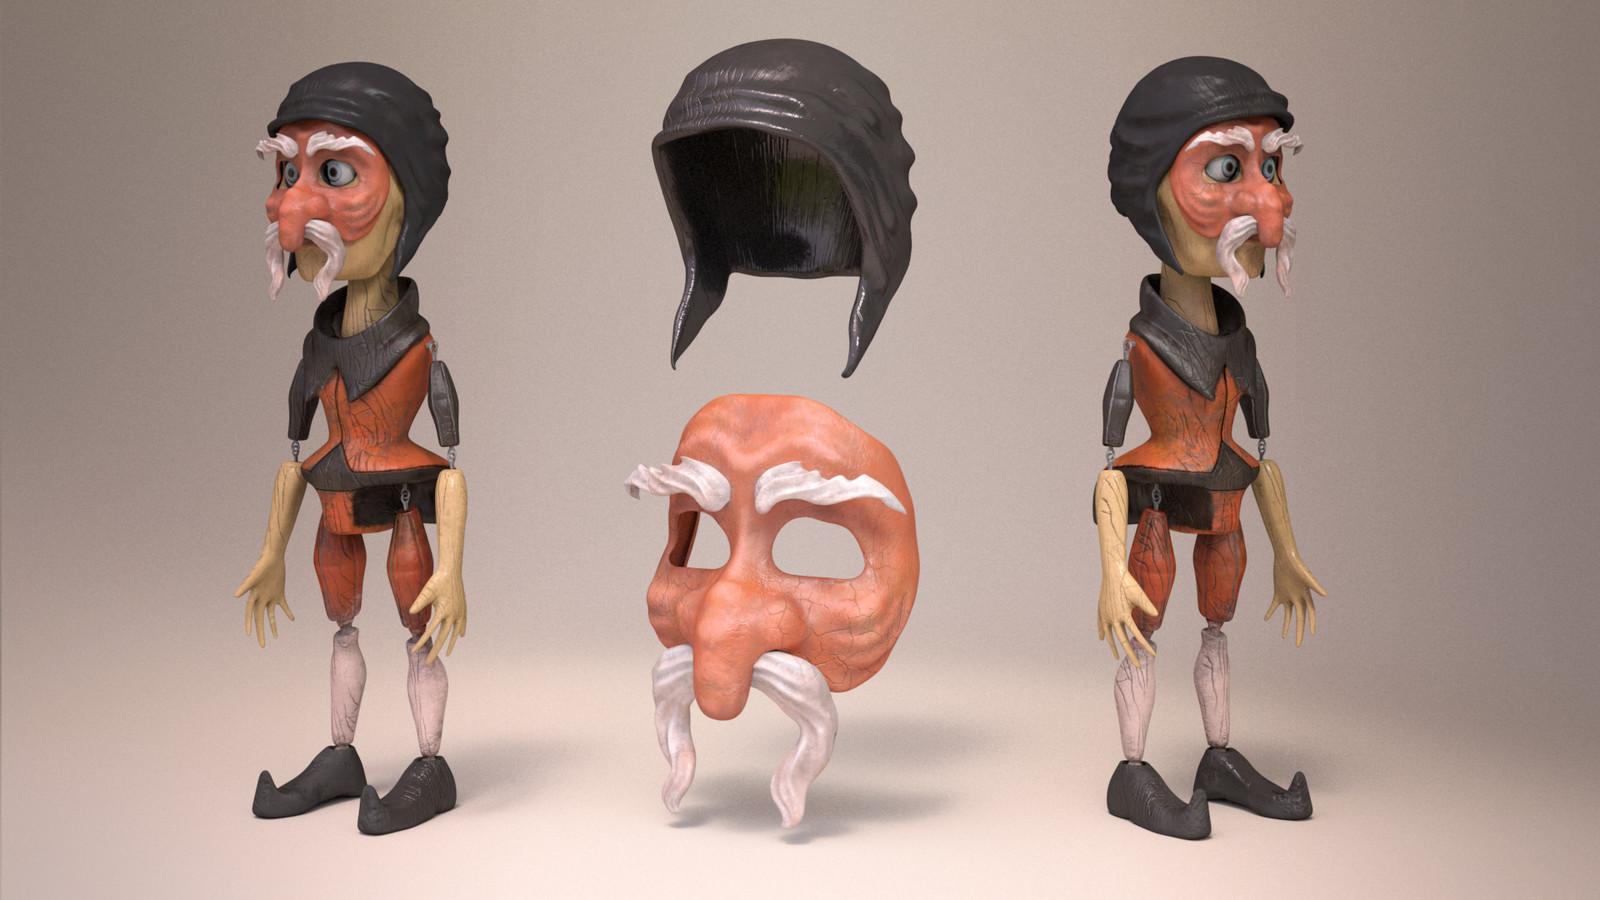 Pantalone Marionette Puppet